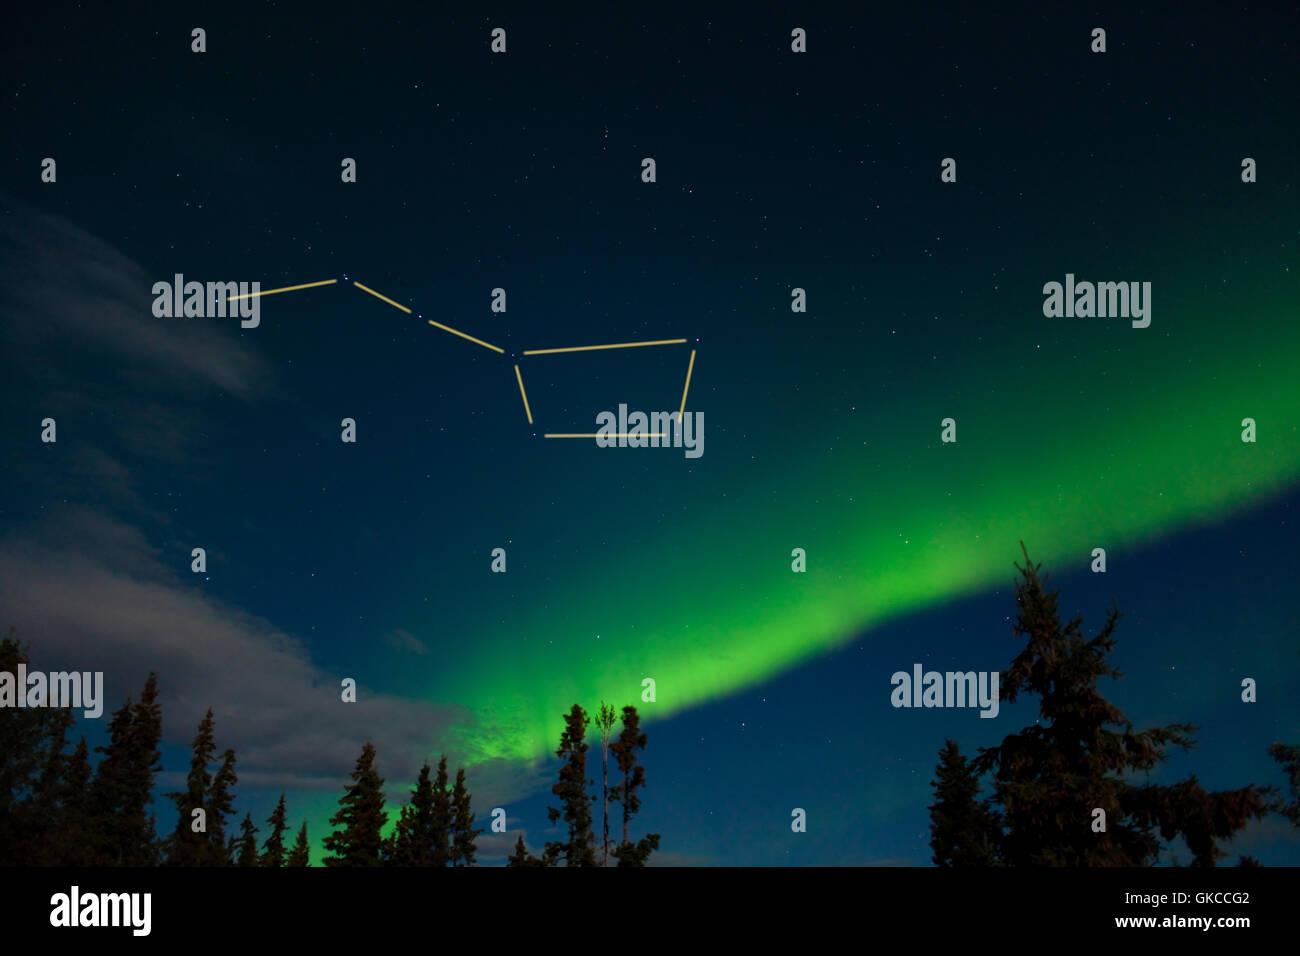 Big Dipper and northern lights display - Stock Image